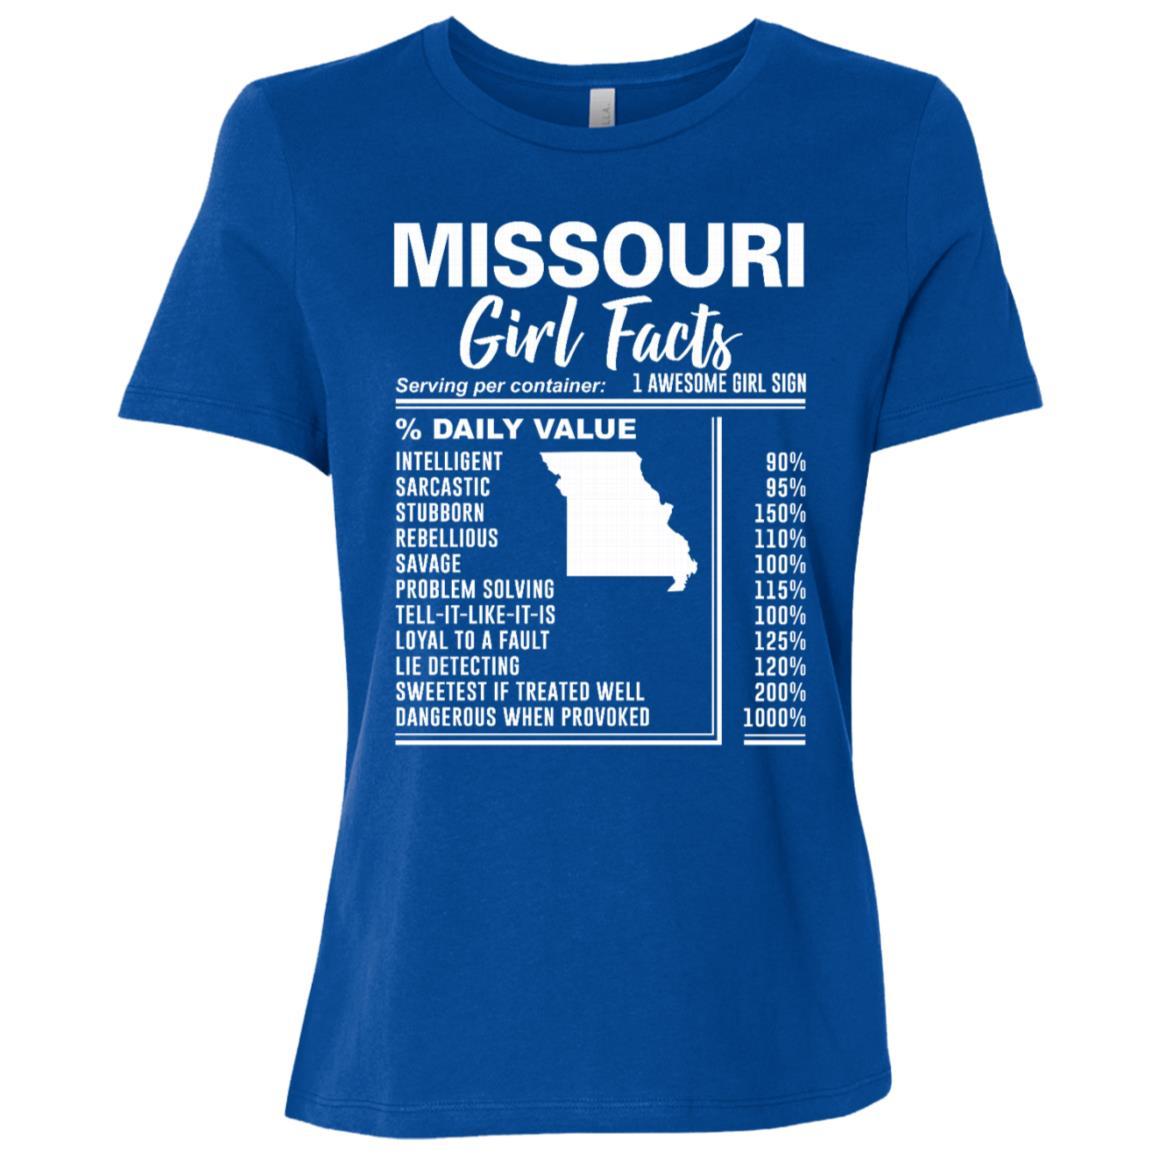 Born in Missouri – Missouri Girl Facts Women Short Sleeve T-Shirt